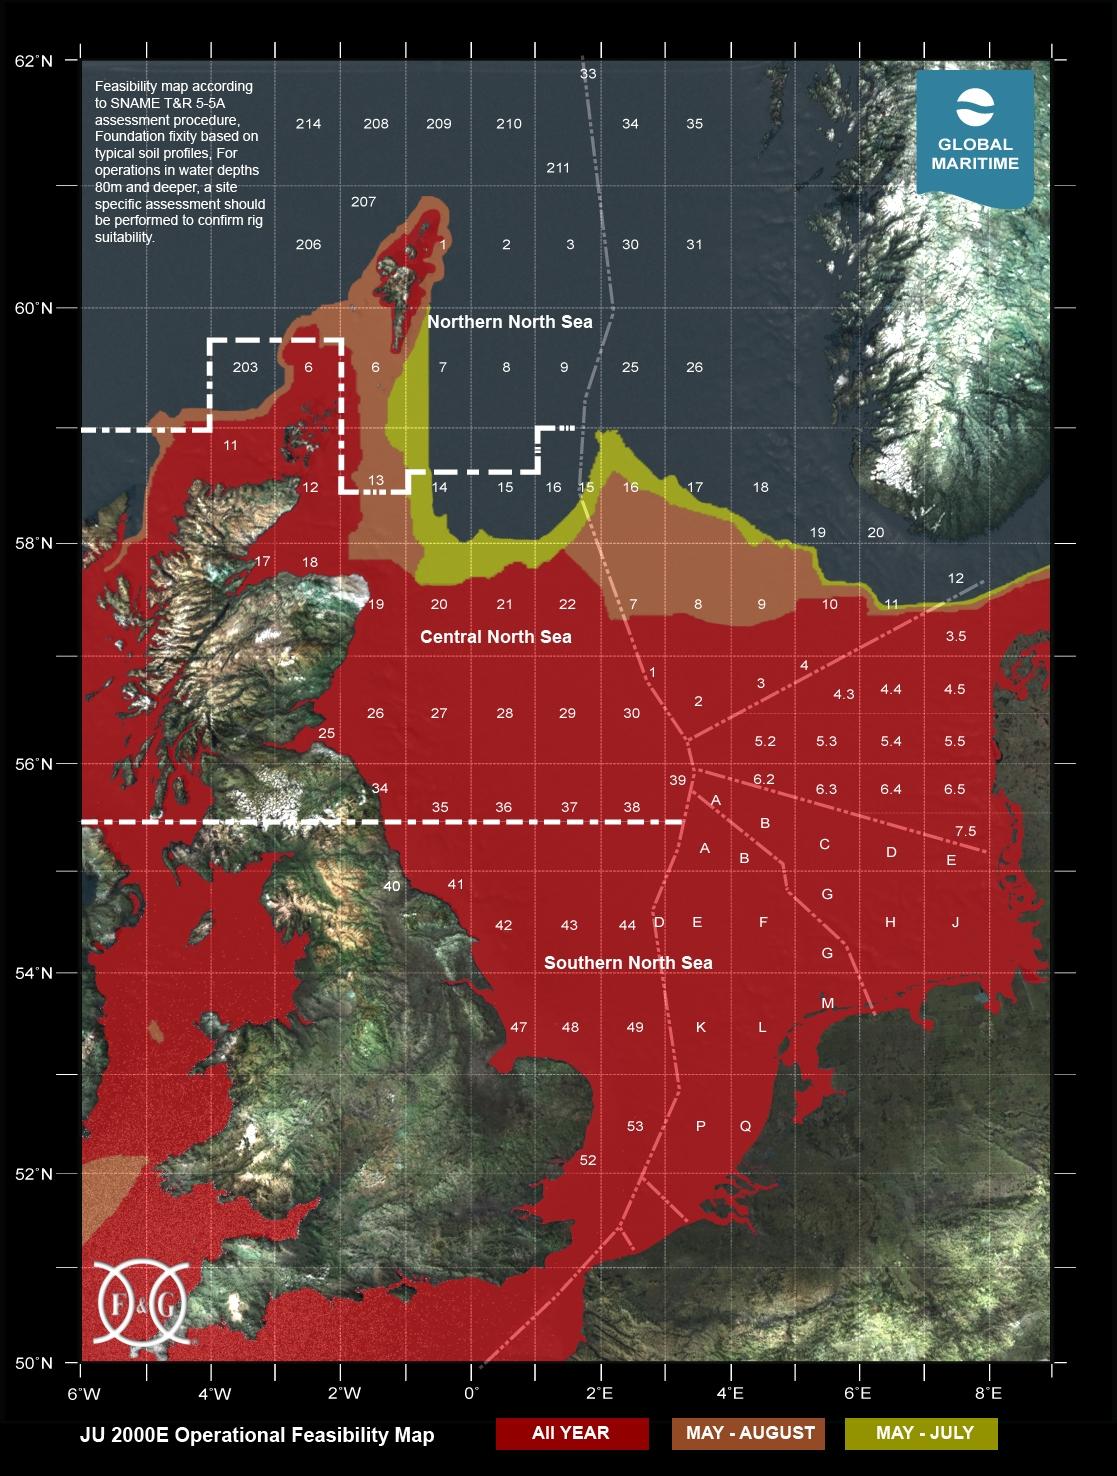 Redrawn map